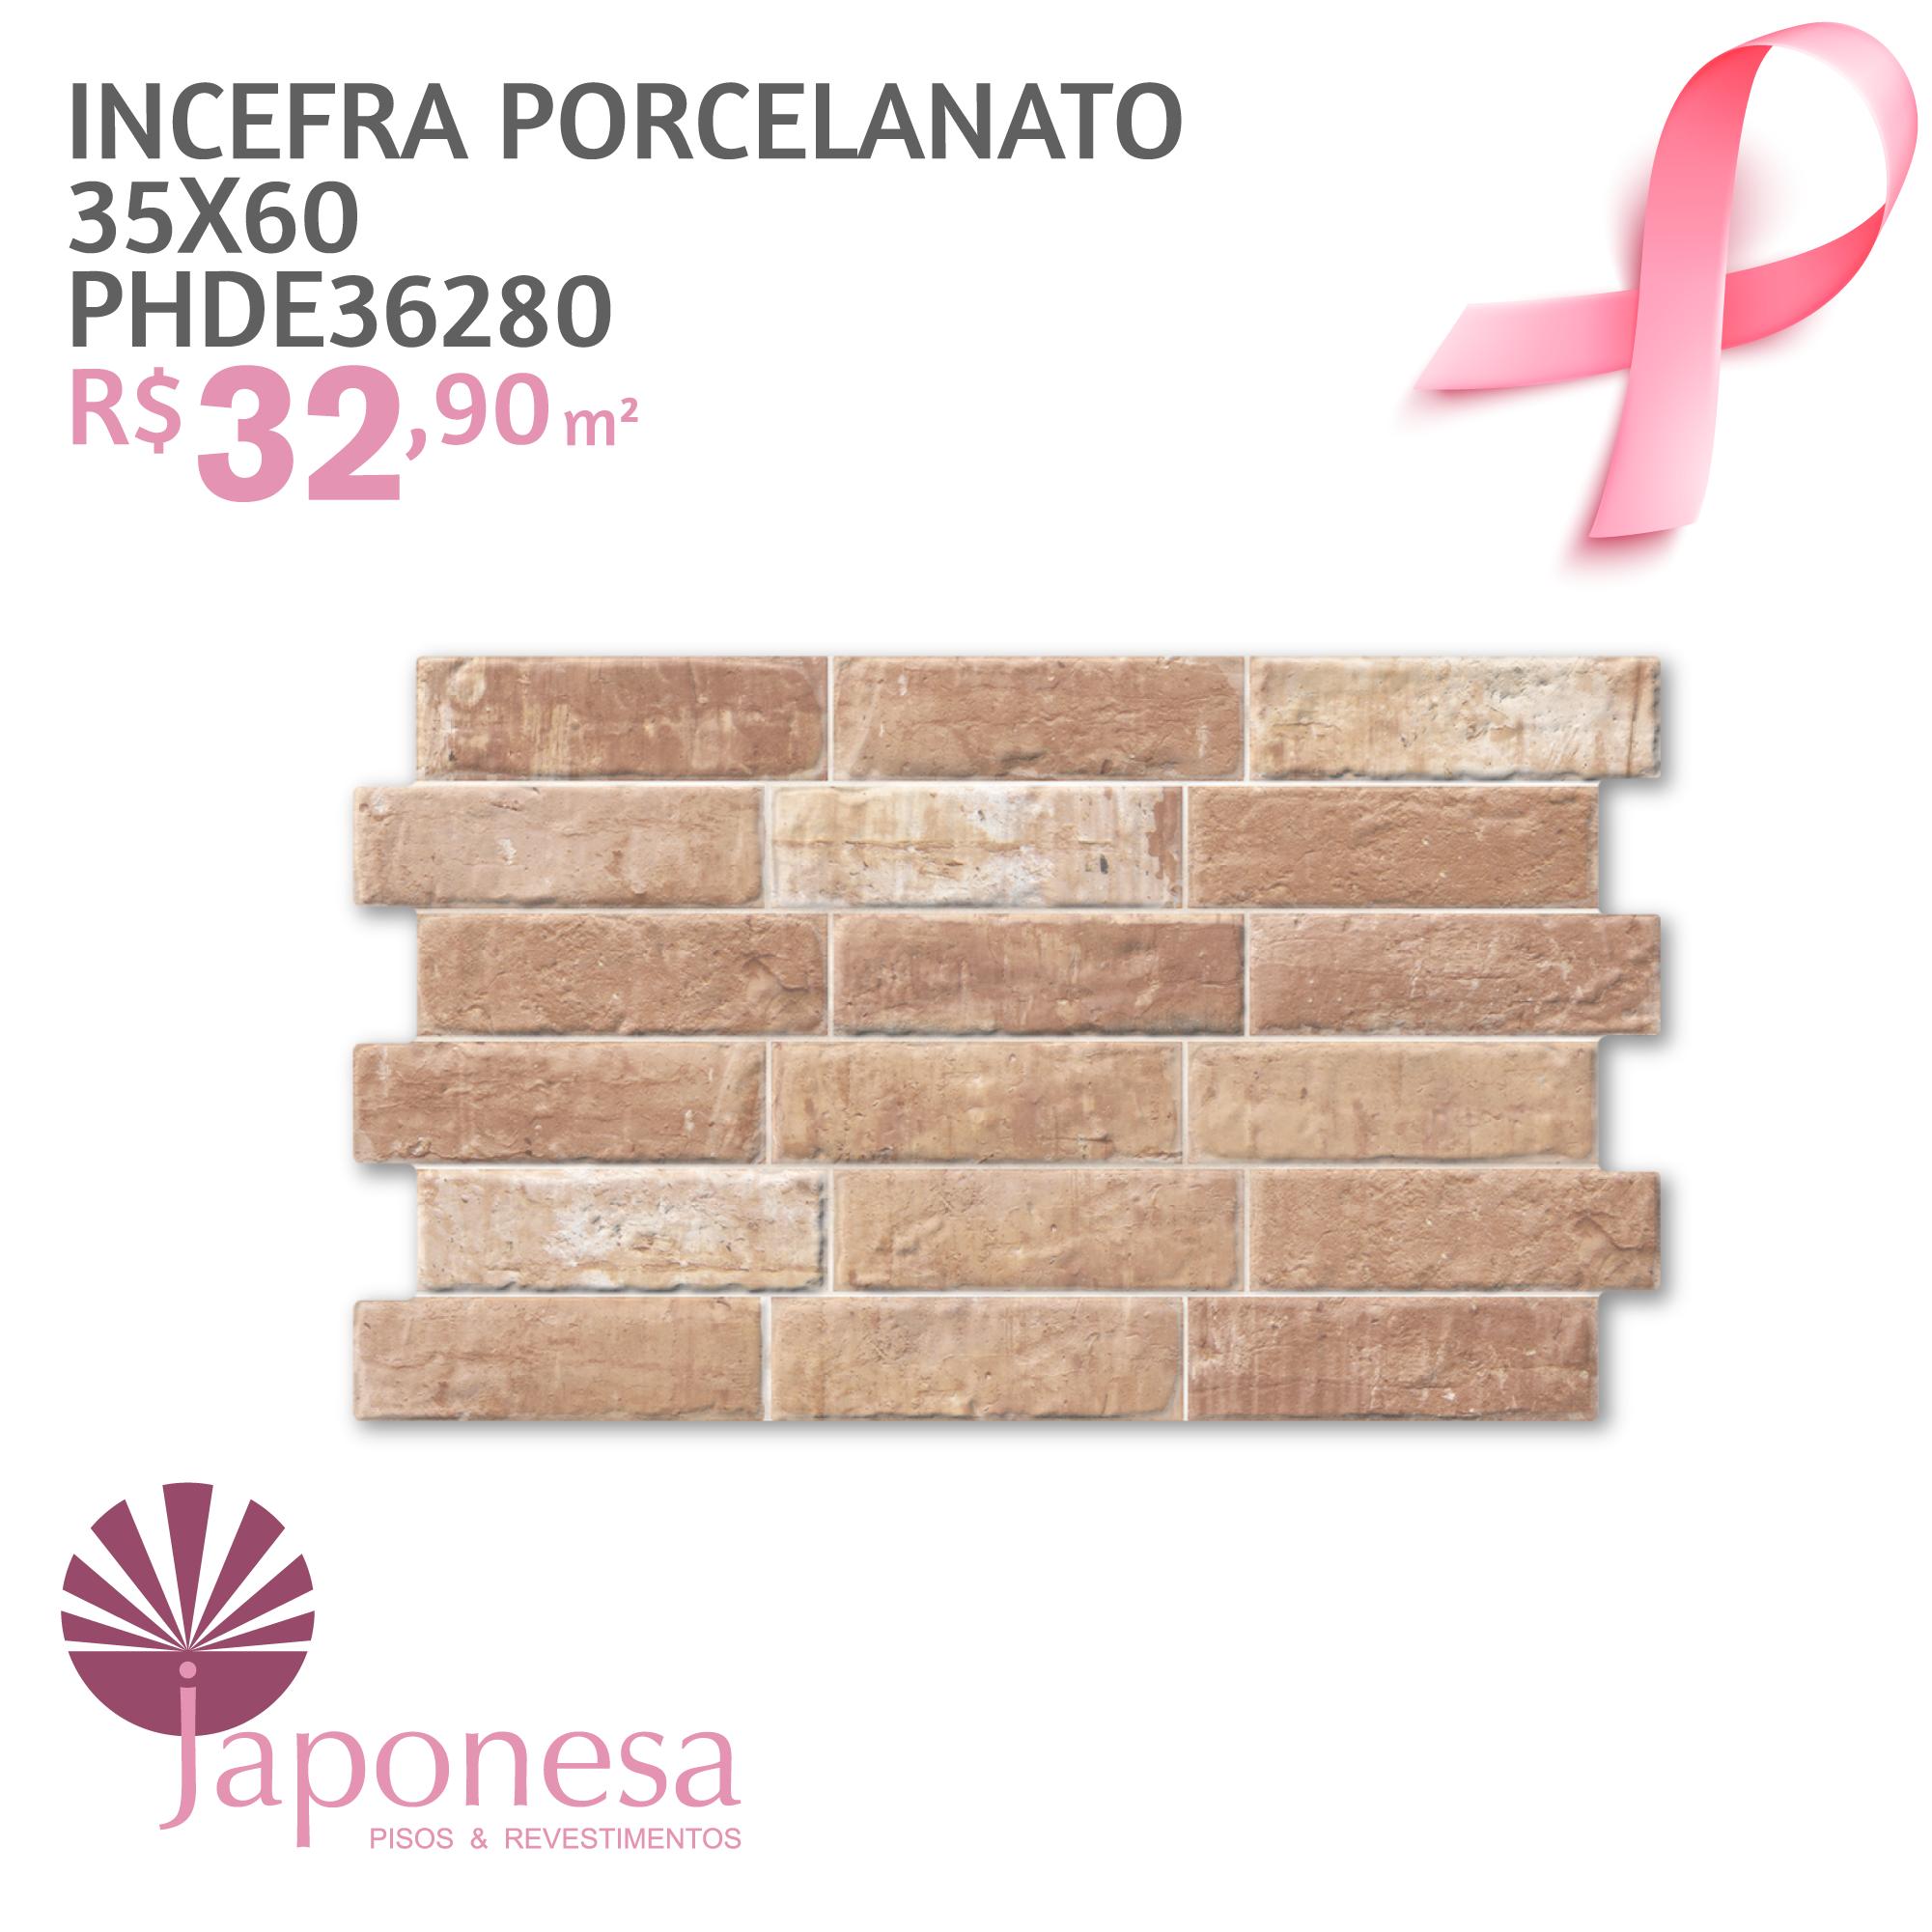 Incefra Porcelanato 35×60 PHDE36280